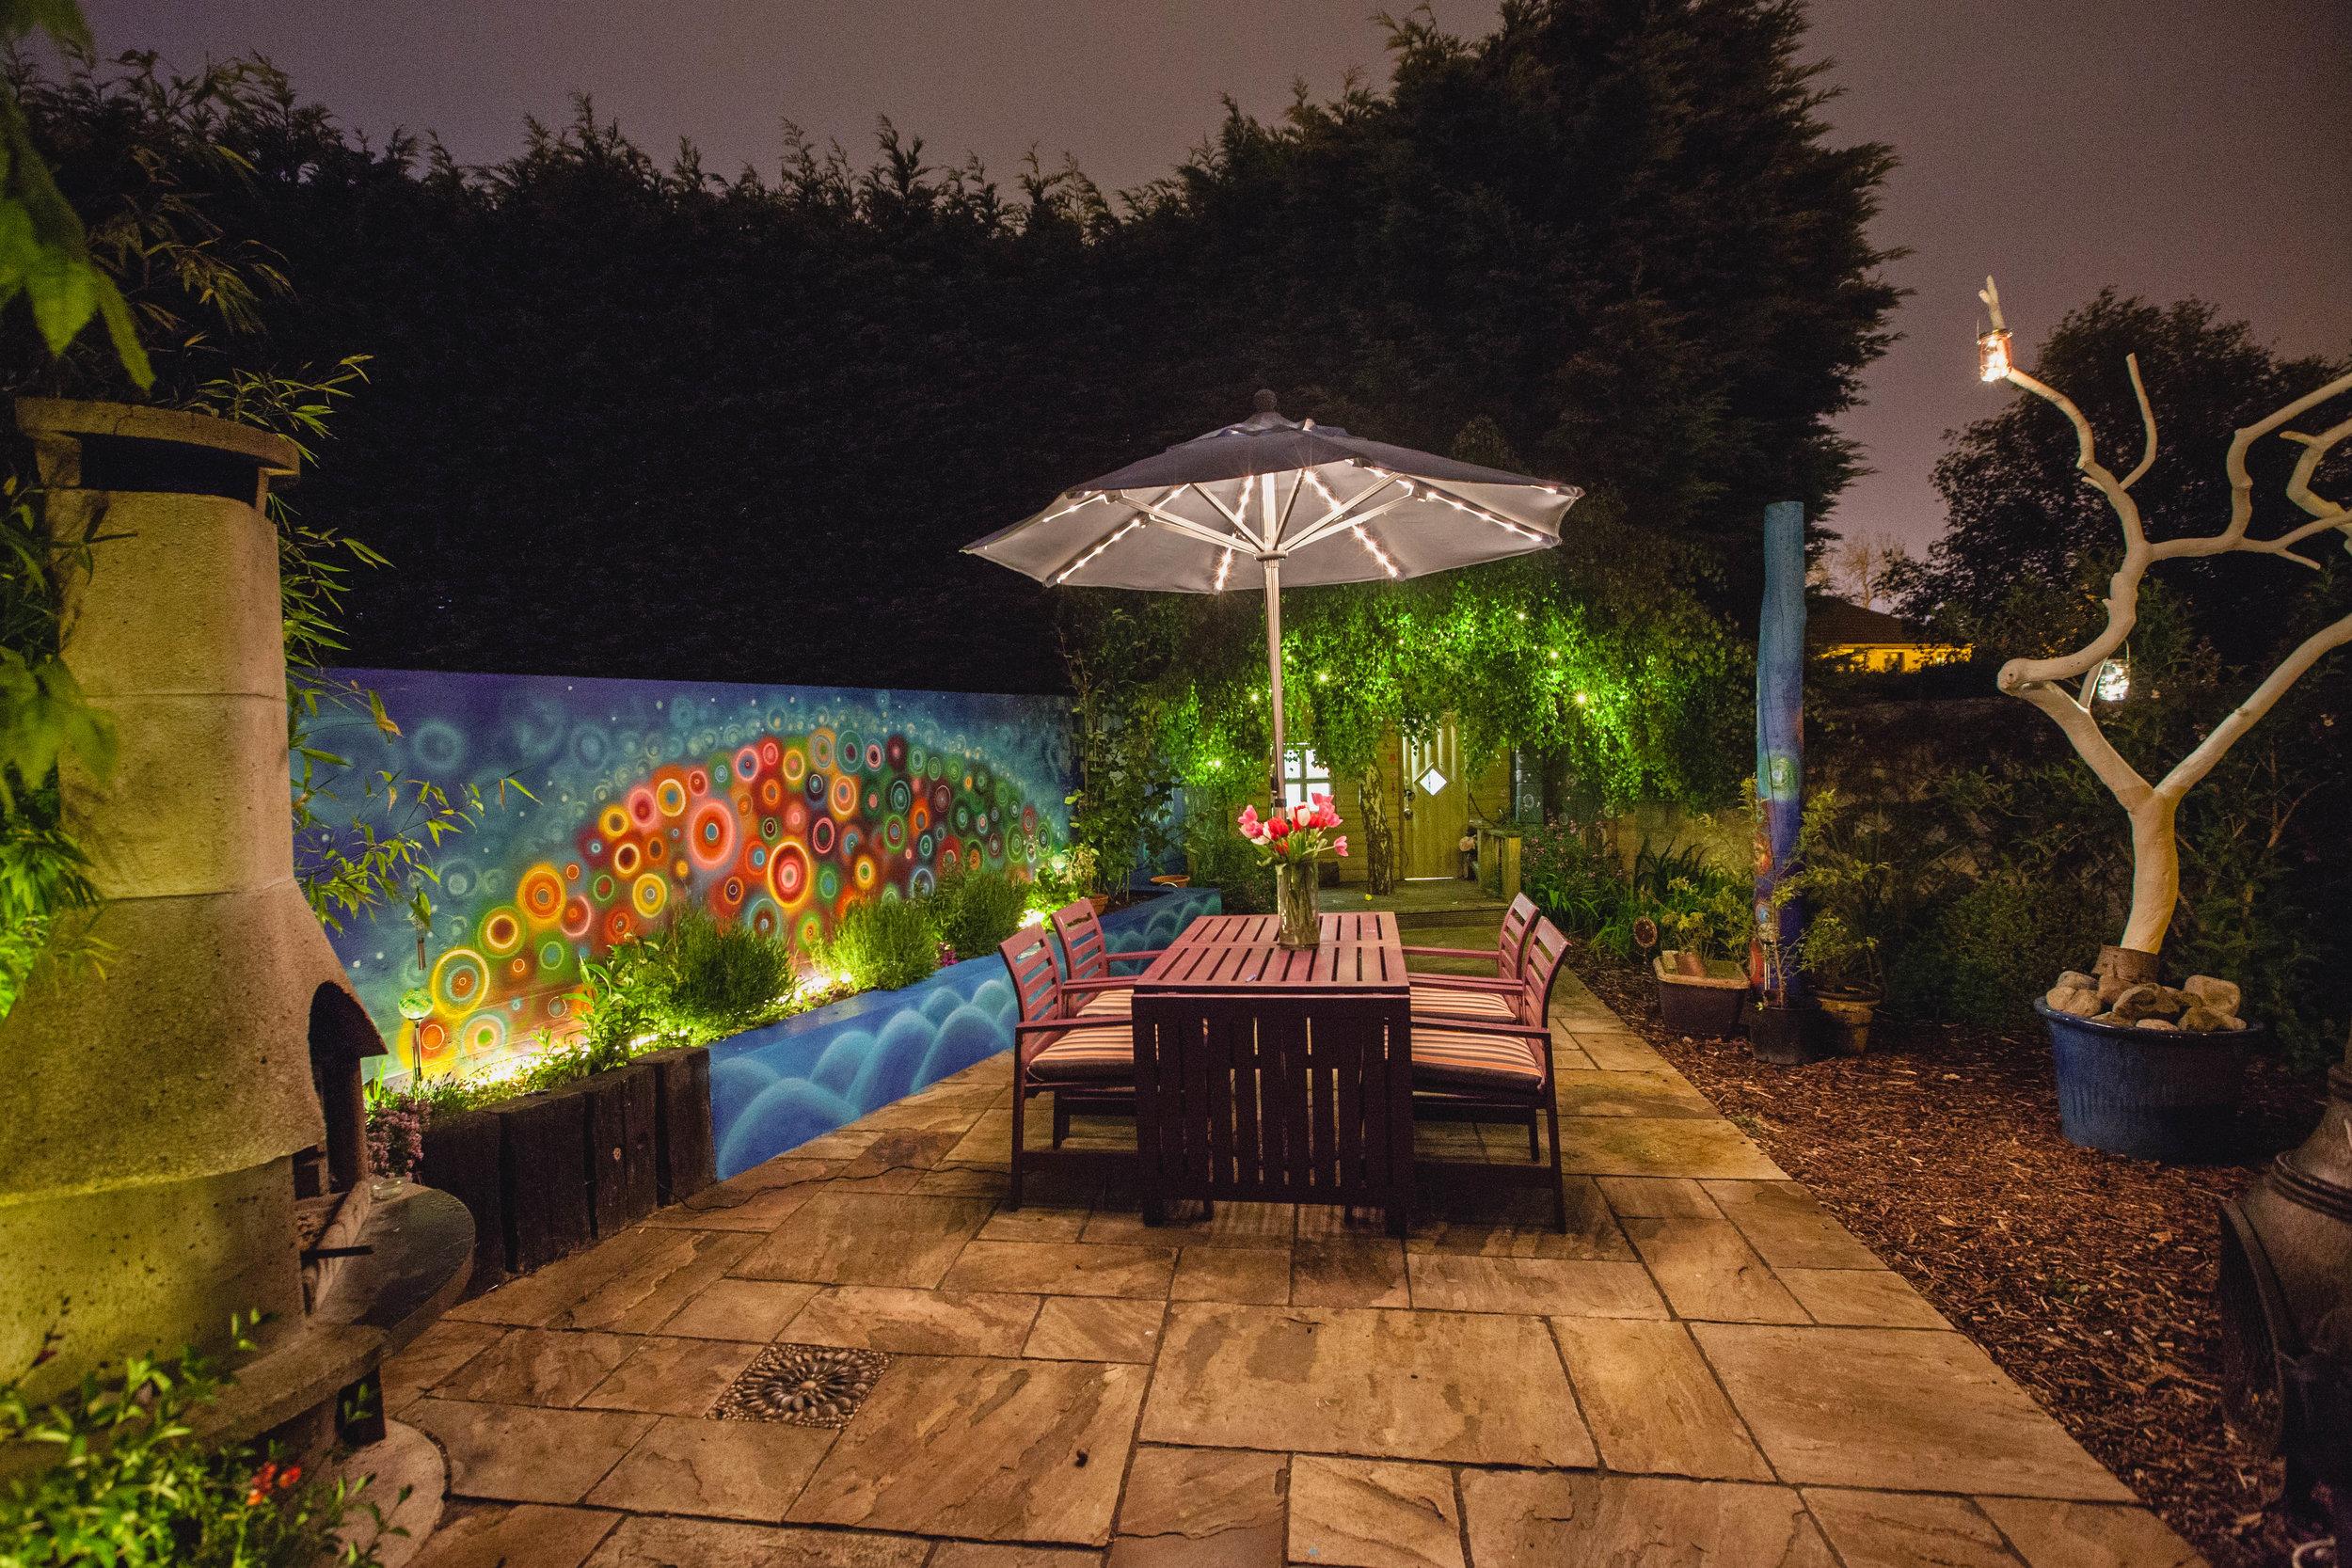 night garden mural